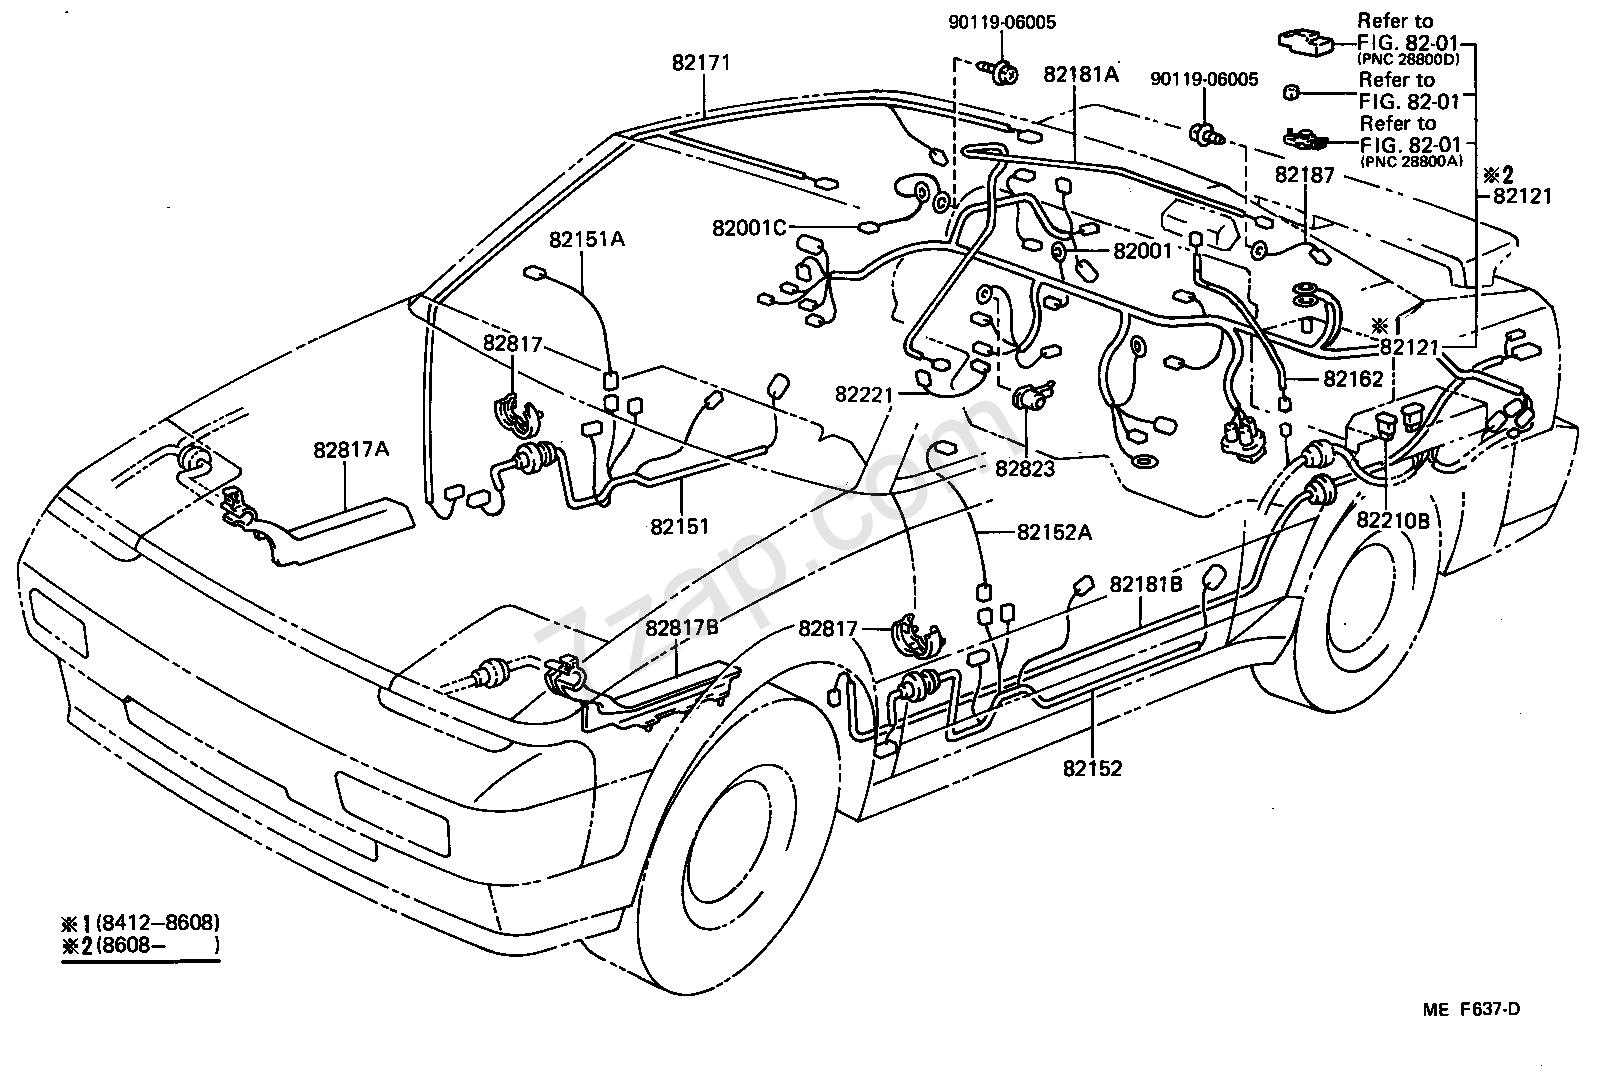 Engine Diagram 1994 Toyota Mr 2 Wiring Diagram Diode World Diode World Hoteloctavia It